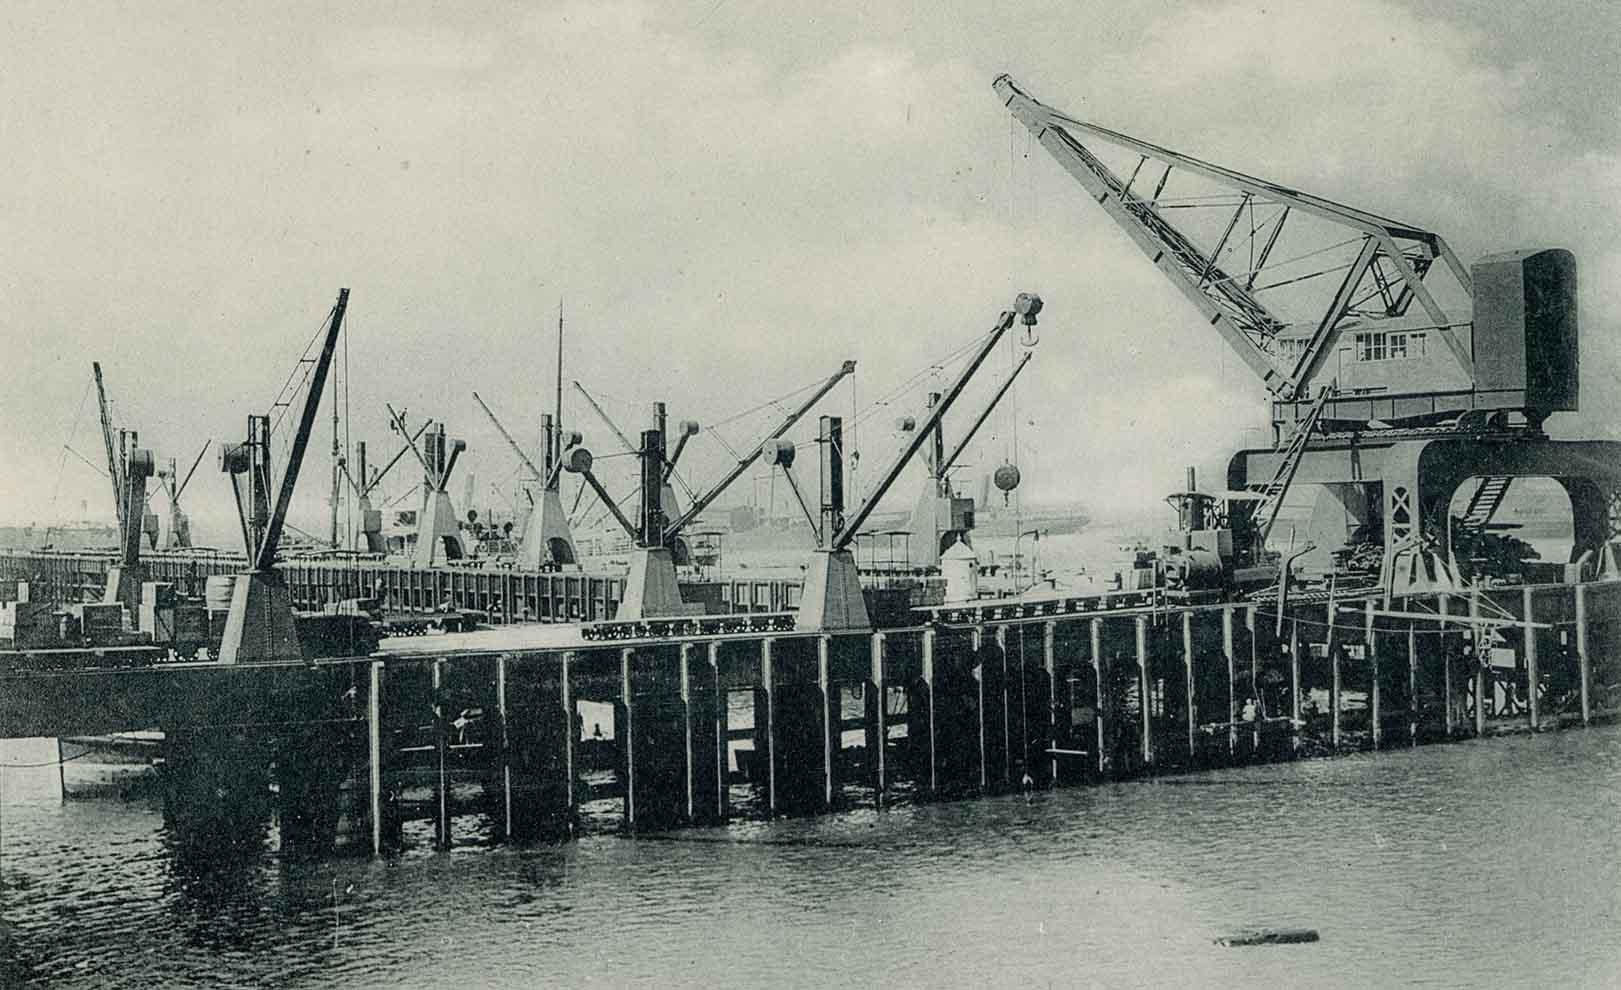 Enterreno - Fotos históricas de chile - fotos antiguas de Chile - Muelle fiscal de Valparaíso ca. 1910